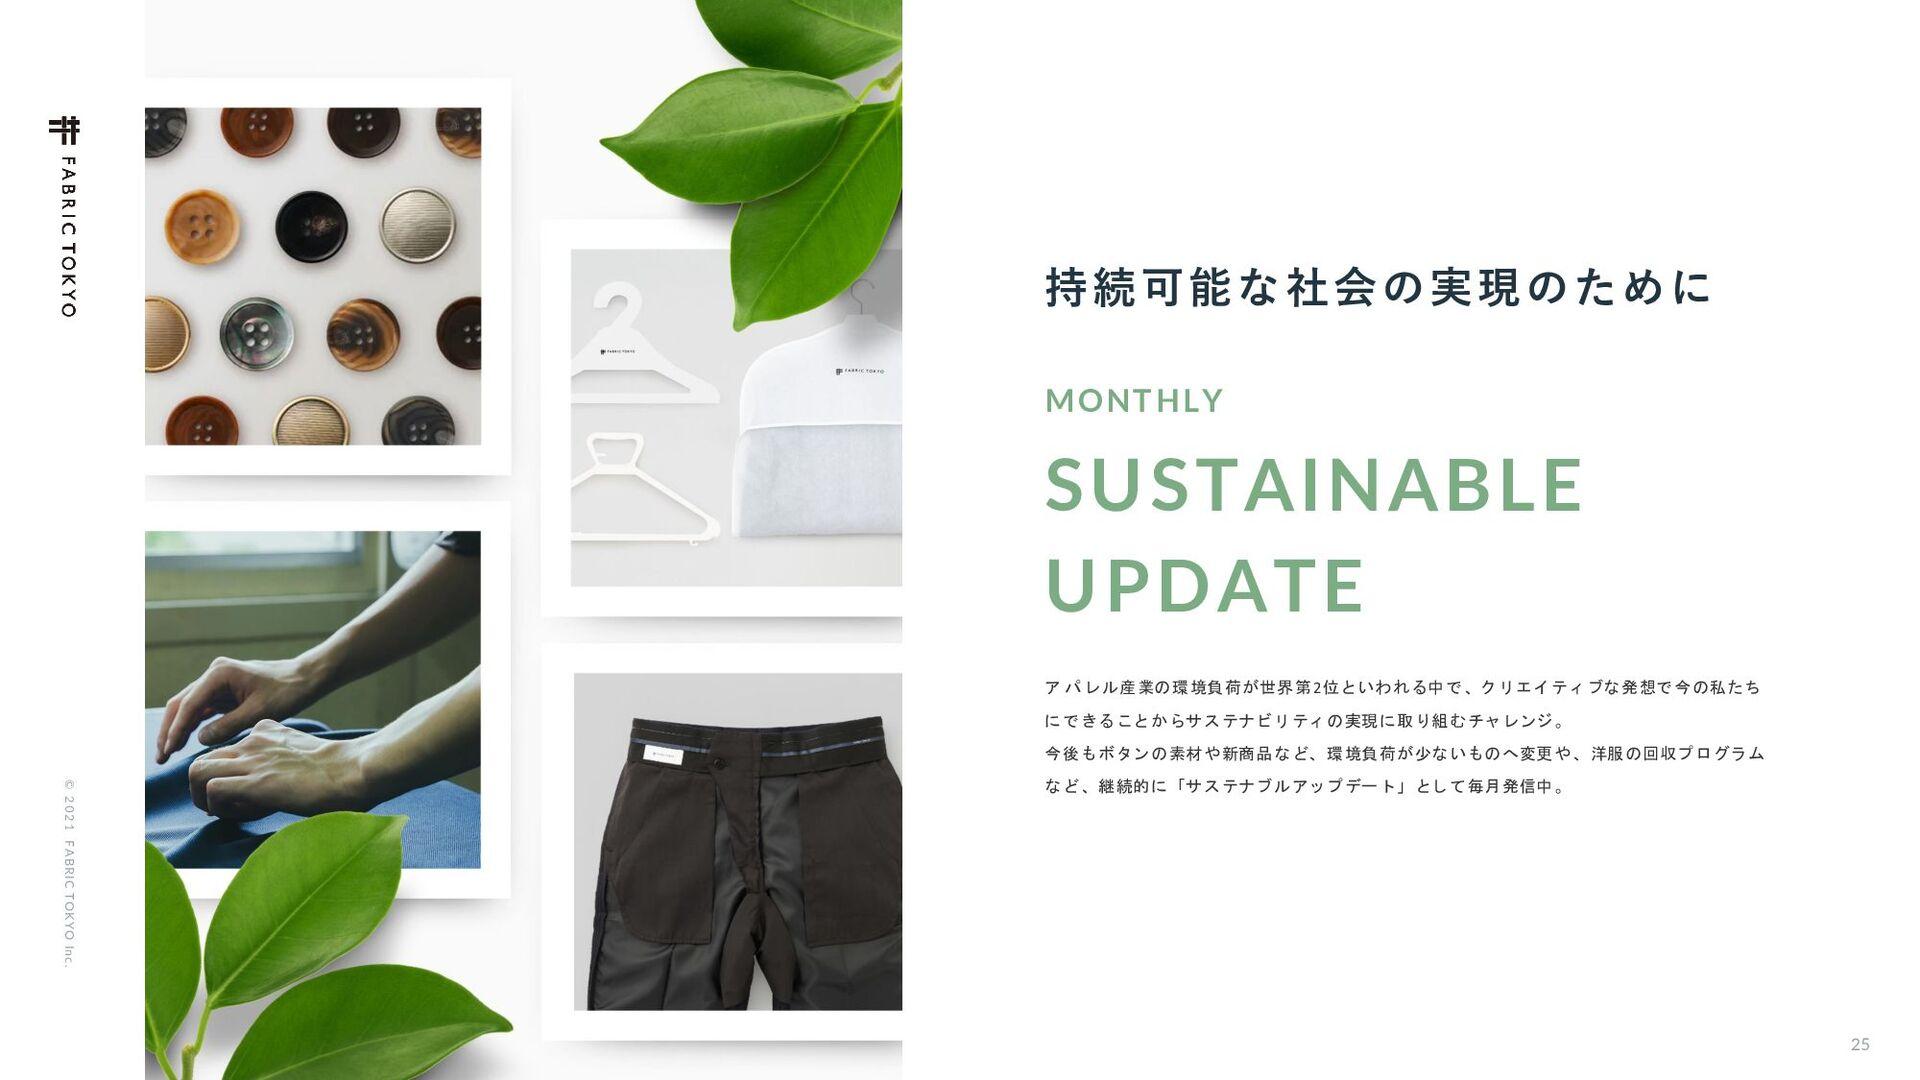 25 © 2021 FABRIC TOKYO Inc. ࢦ͢ͷɺาઌͷશ͘৽͍͠ߪೖମݧ...